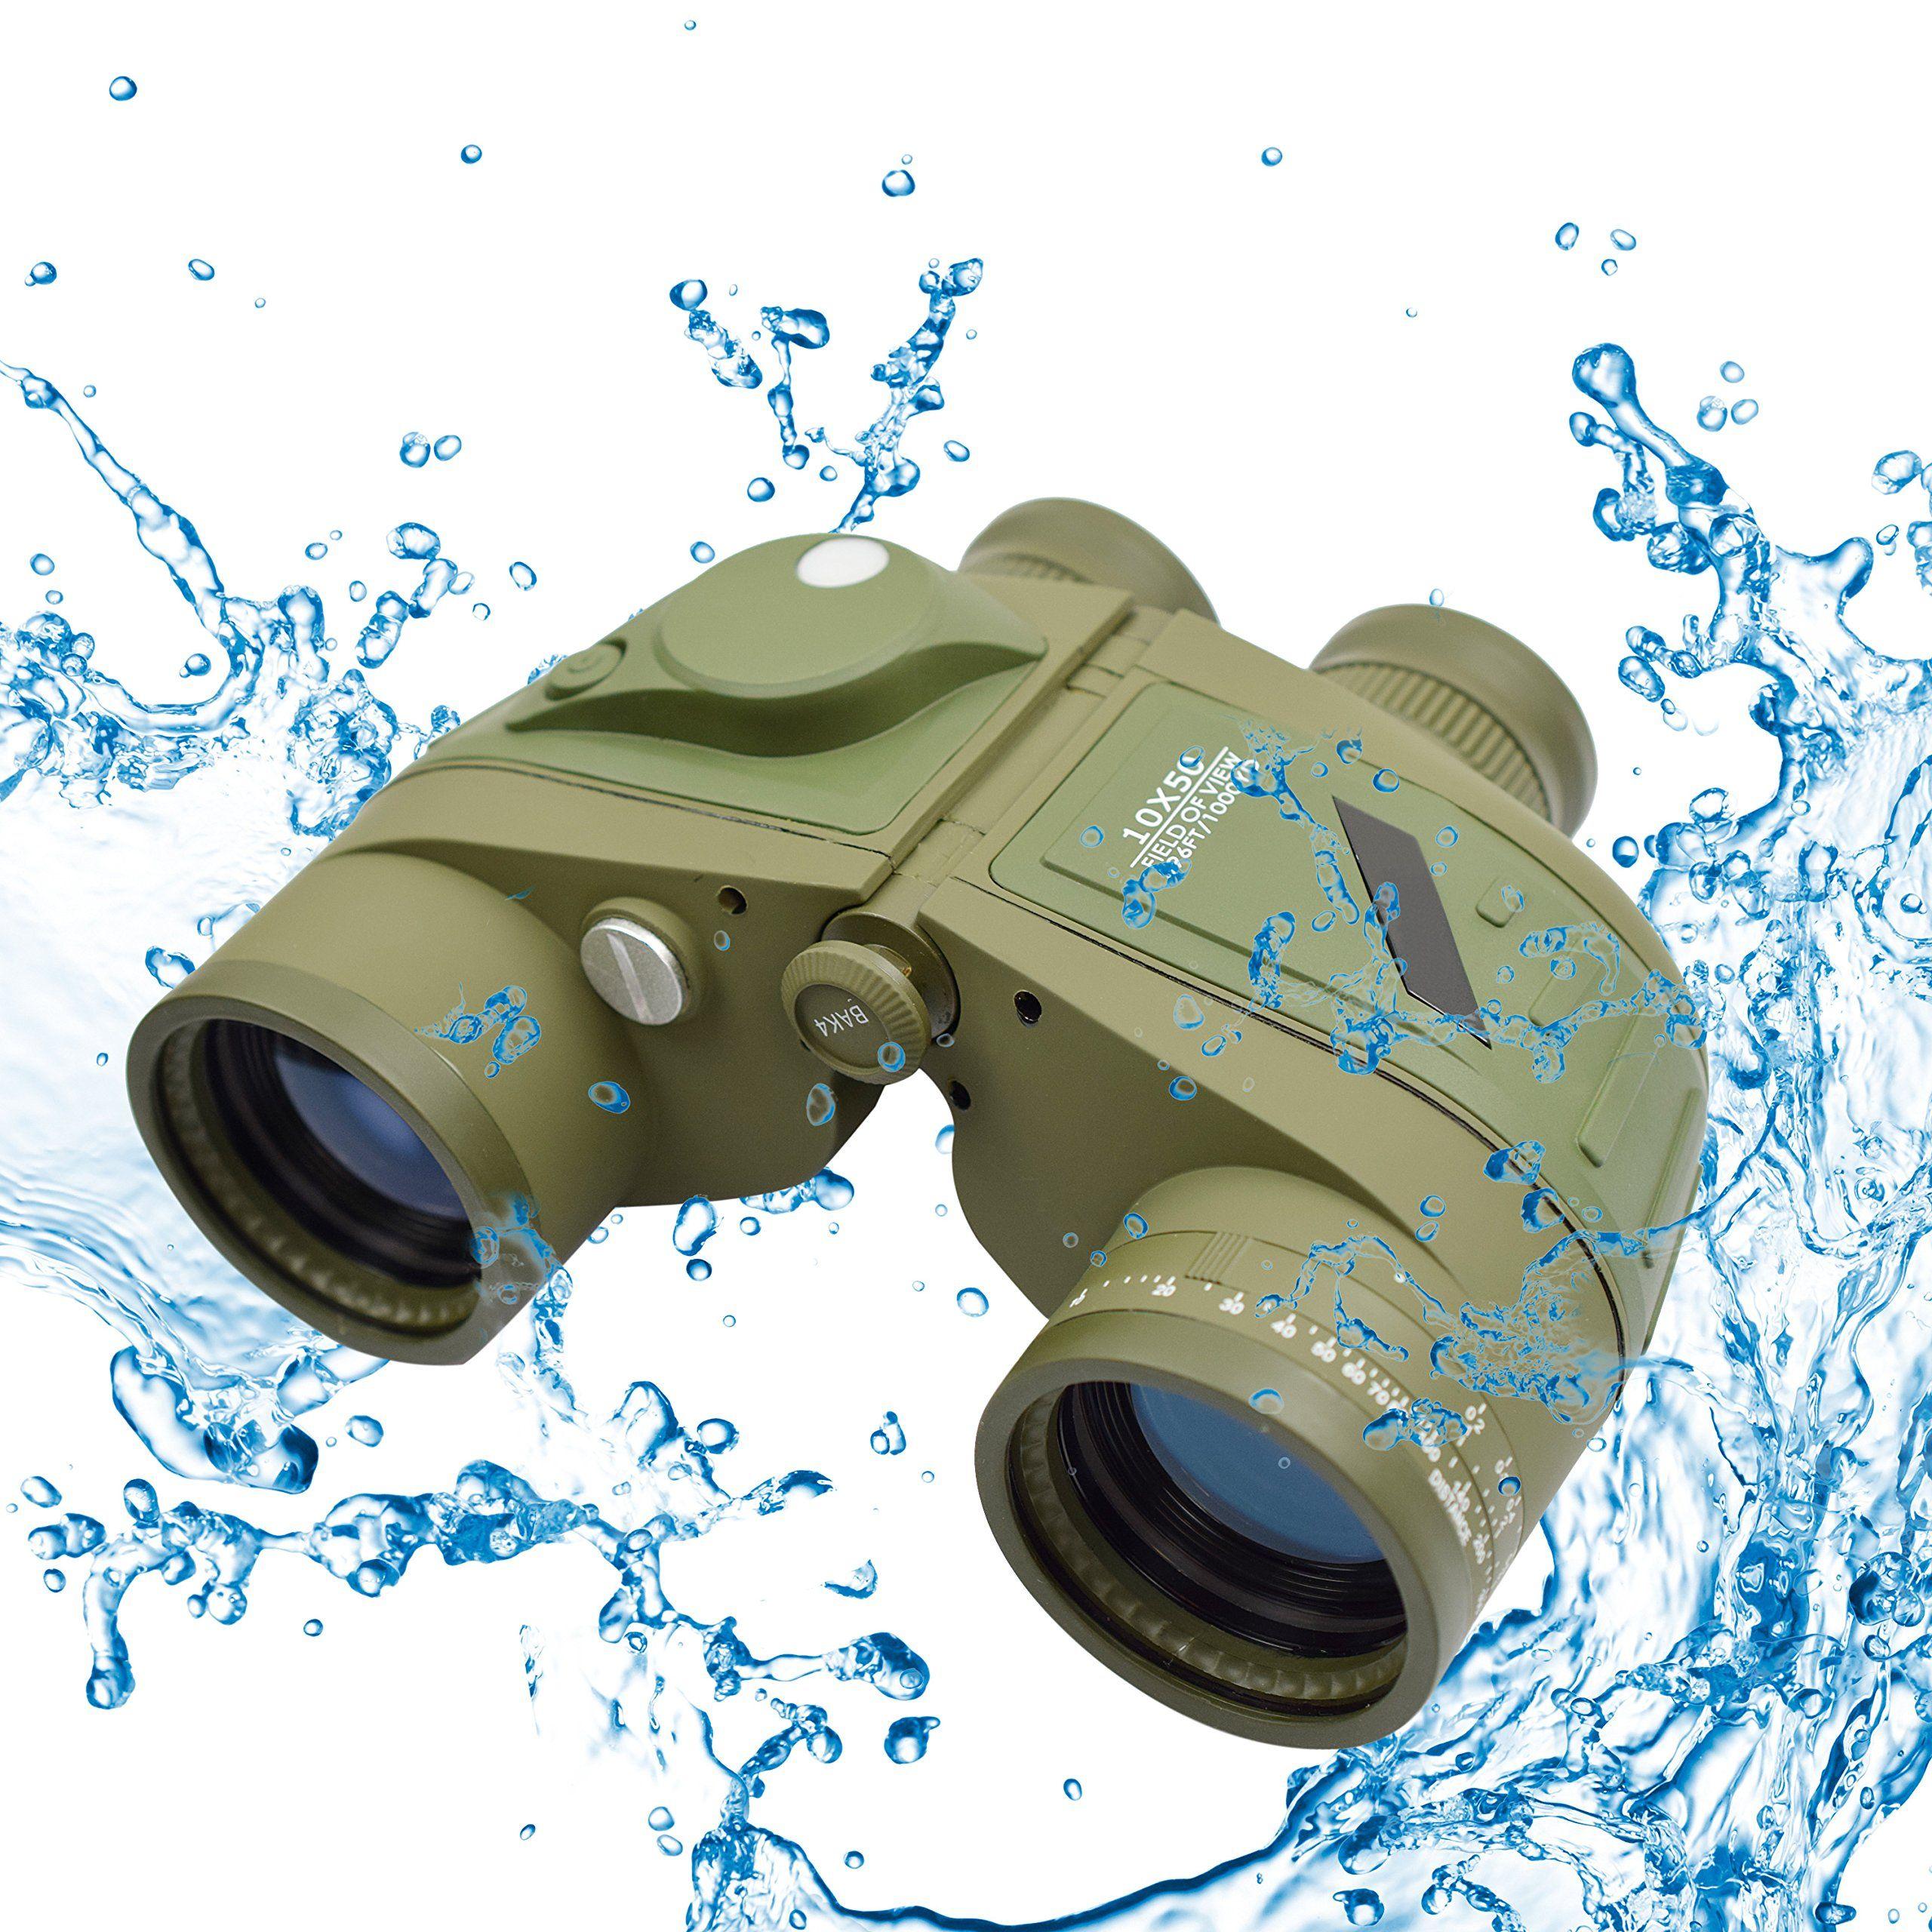 Twod 10X50 Military Army Binoculars with Rangefinder